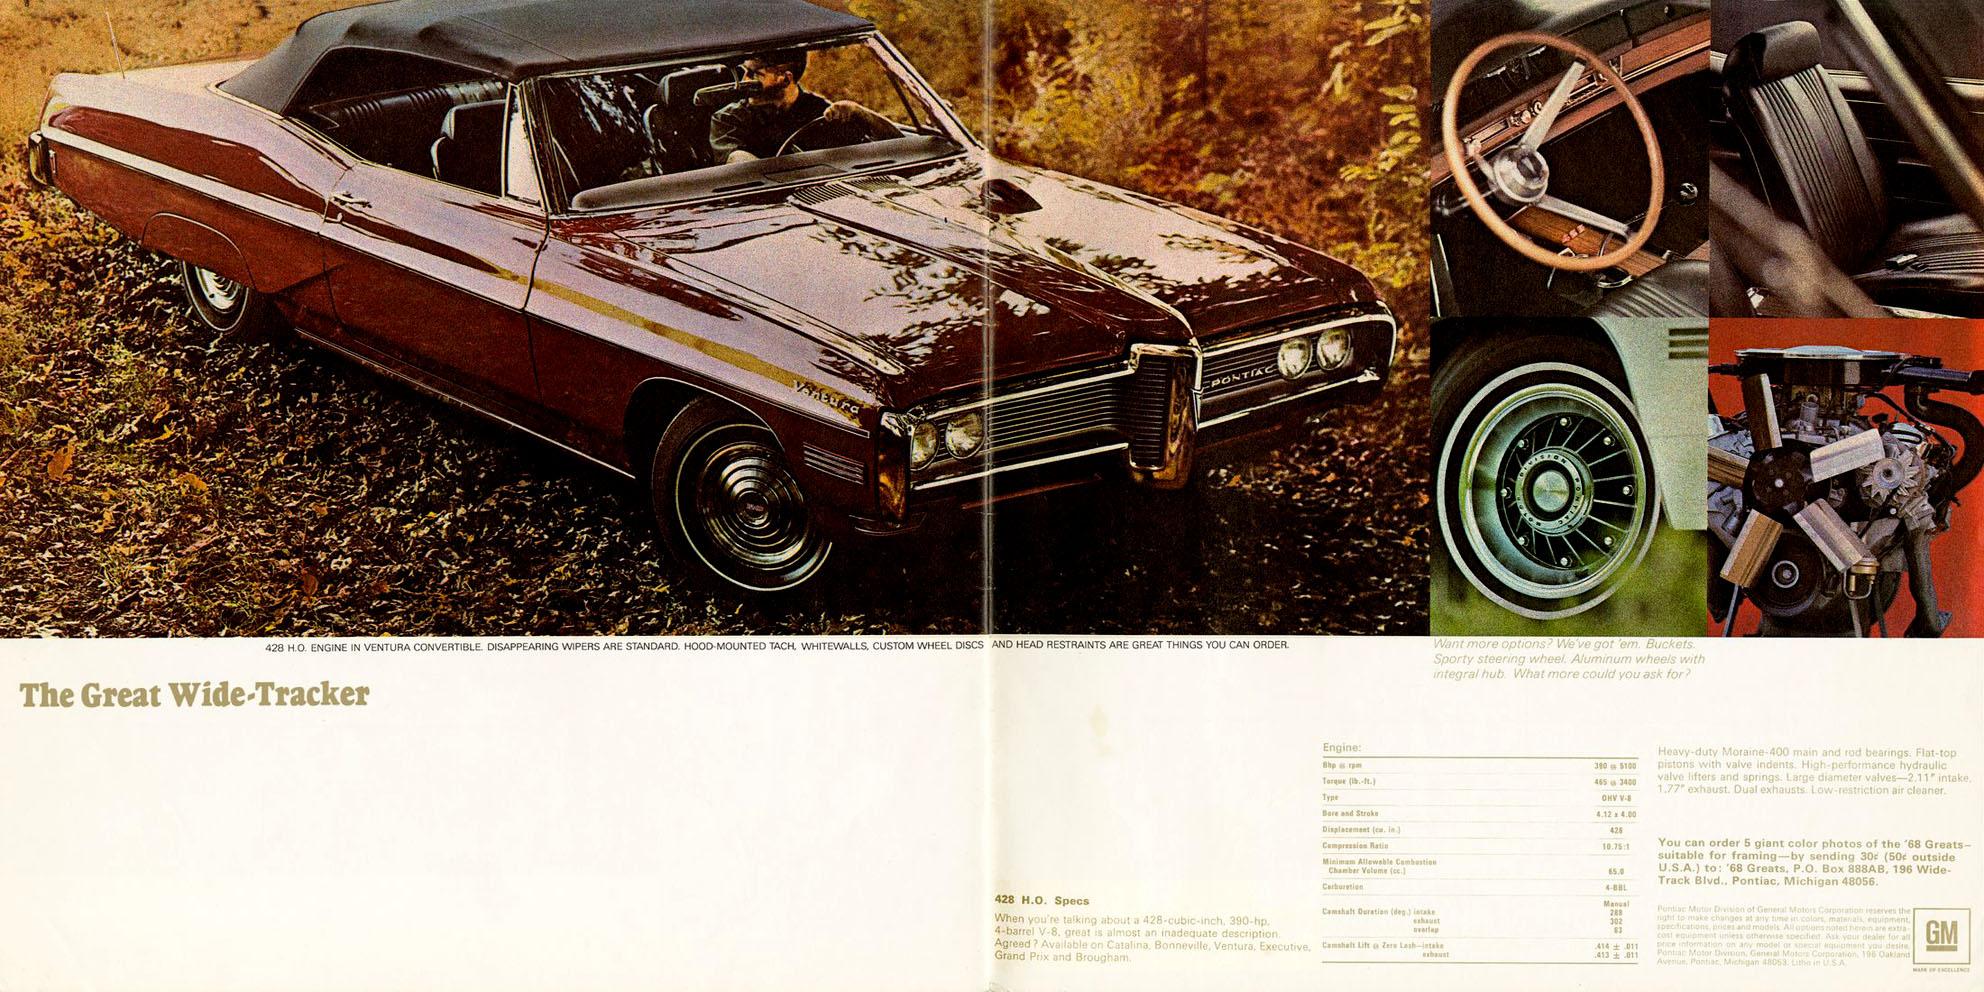 TunnelRam_Pontiac (96).jpg